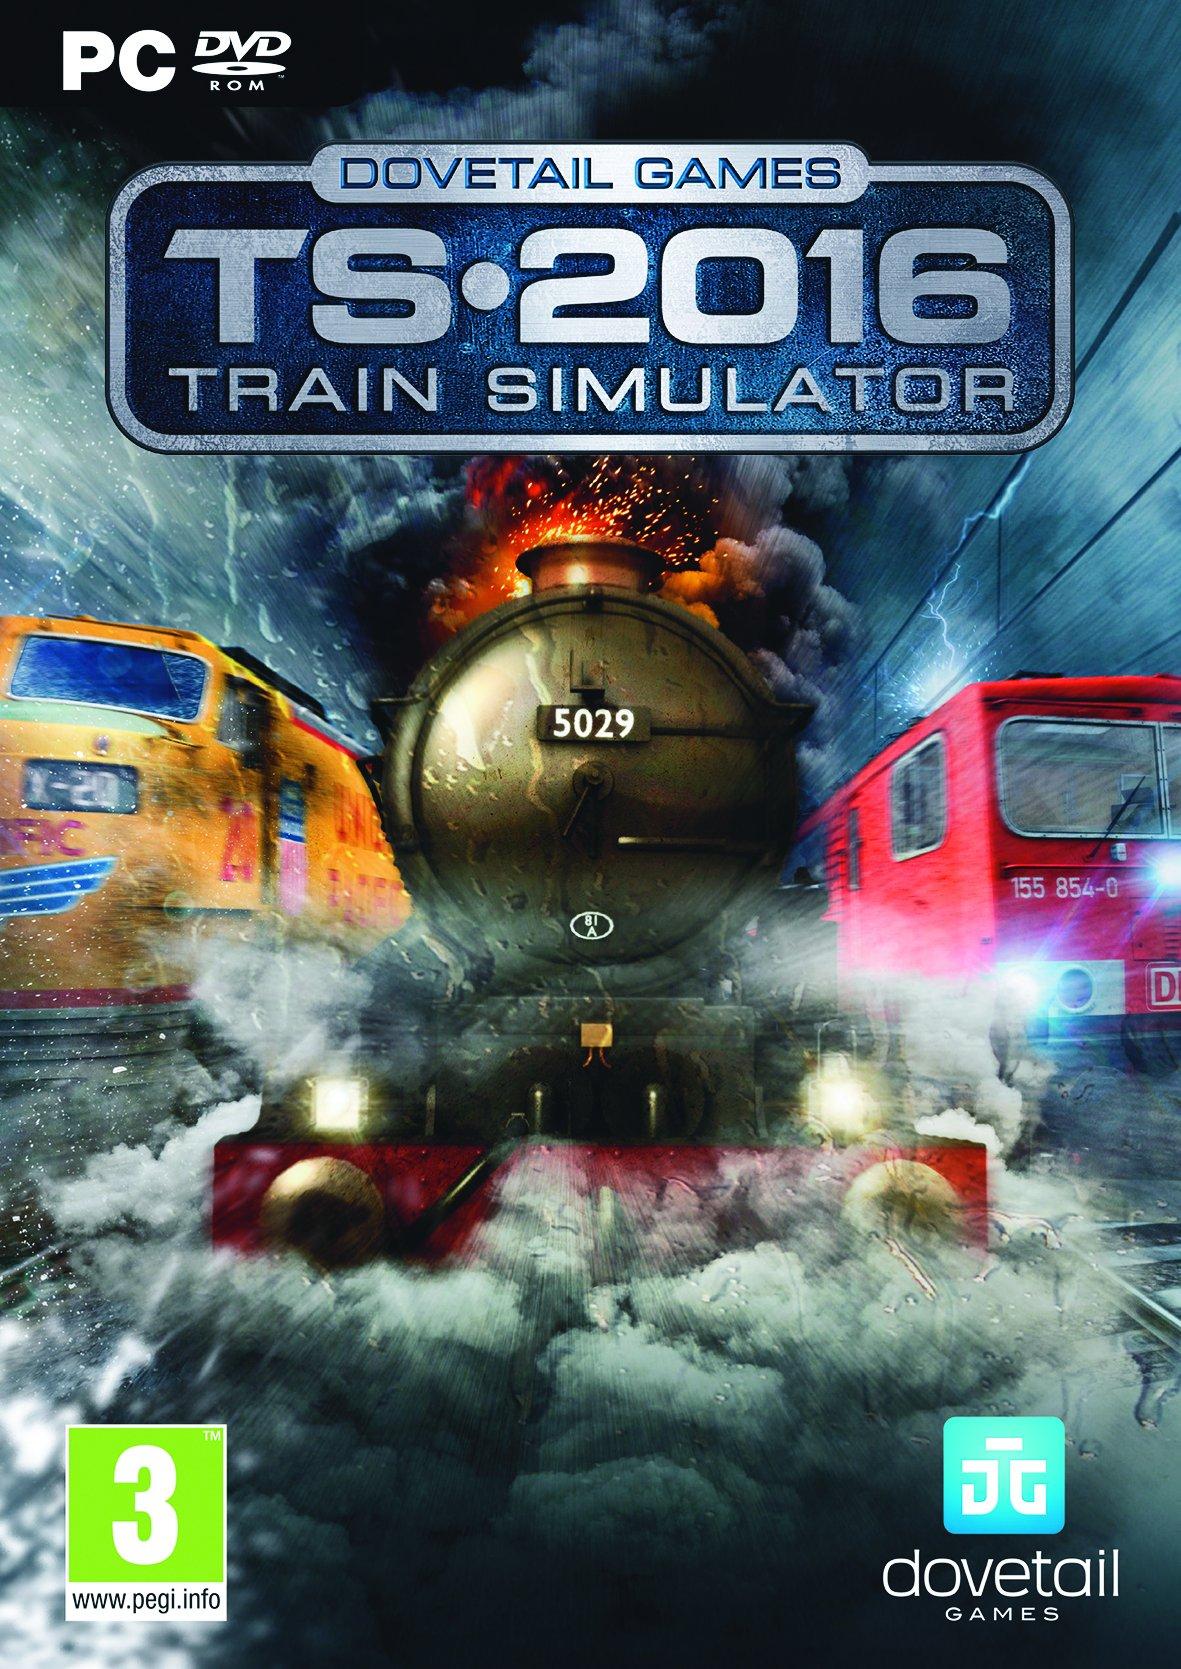 Train Simulator 2016 pc dvd-ის სურათის შედეგი